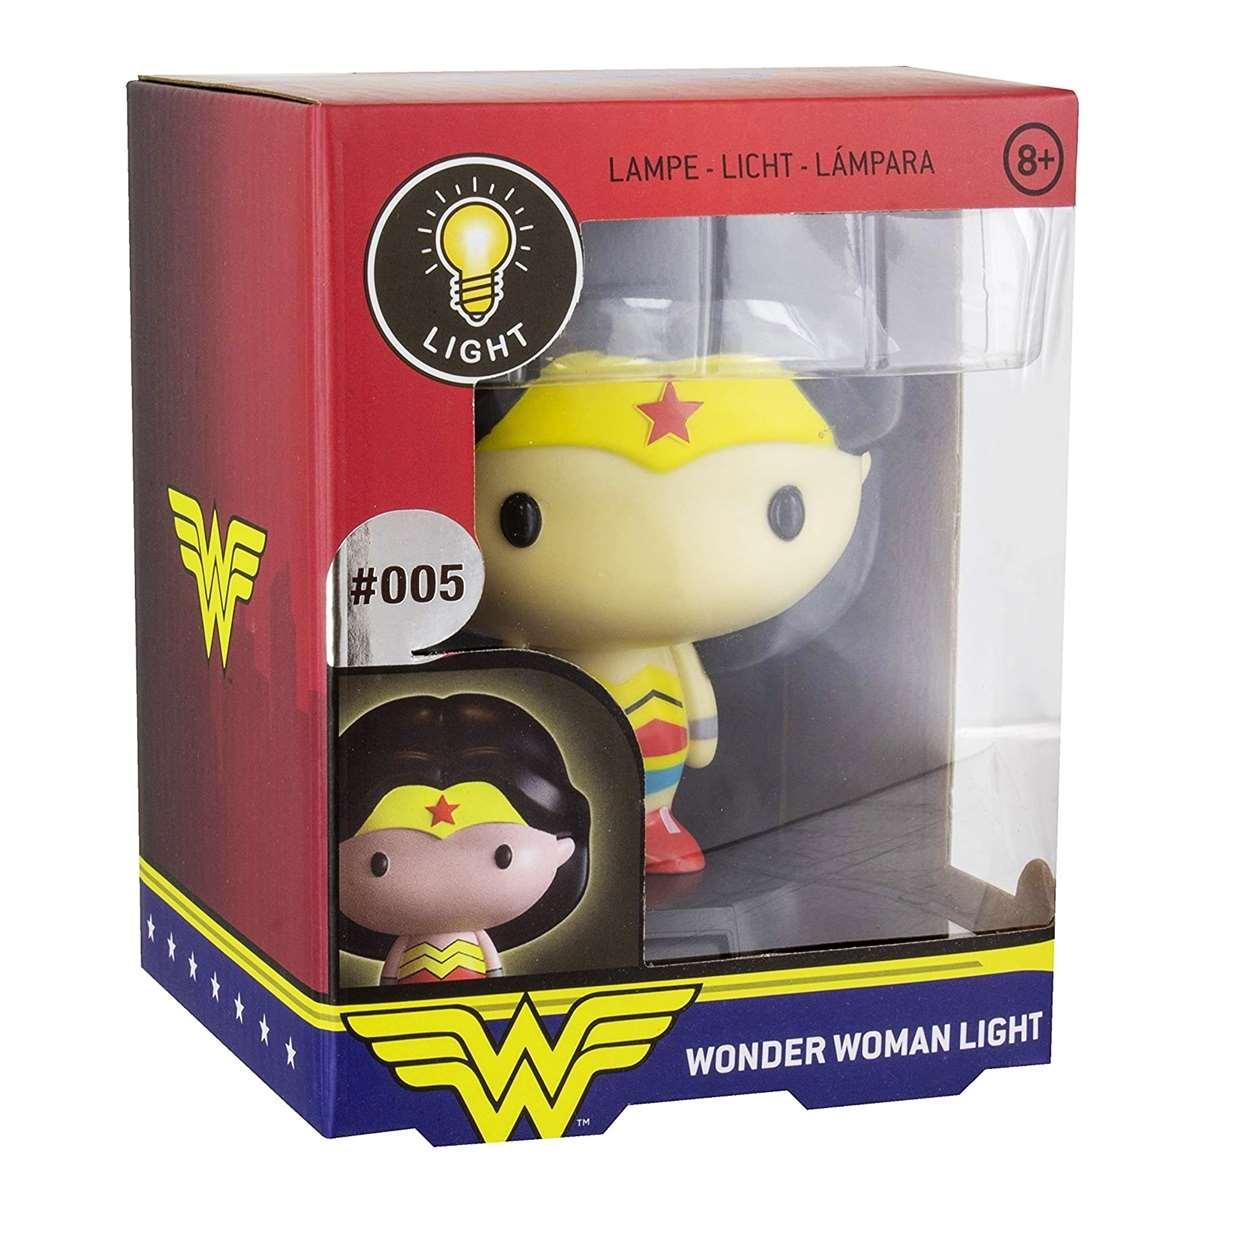 Lámpara Wonder Woman #005 Paladone Collect Them All Series